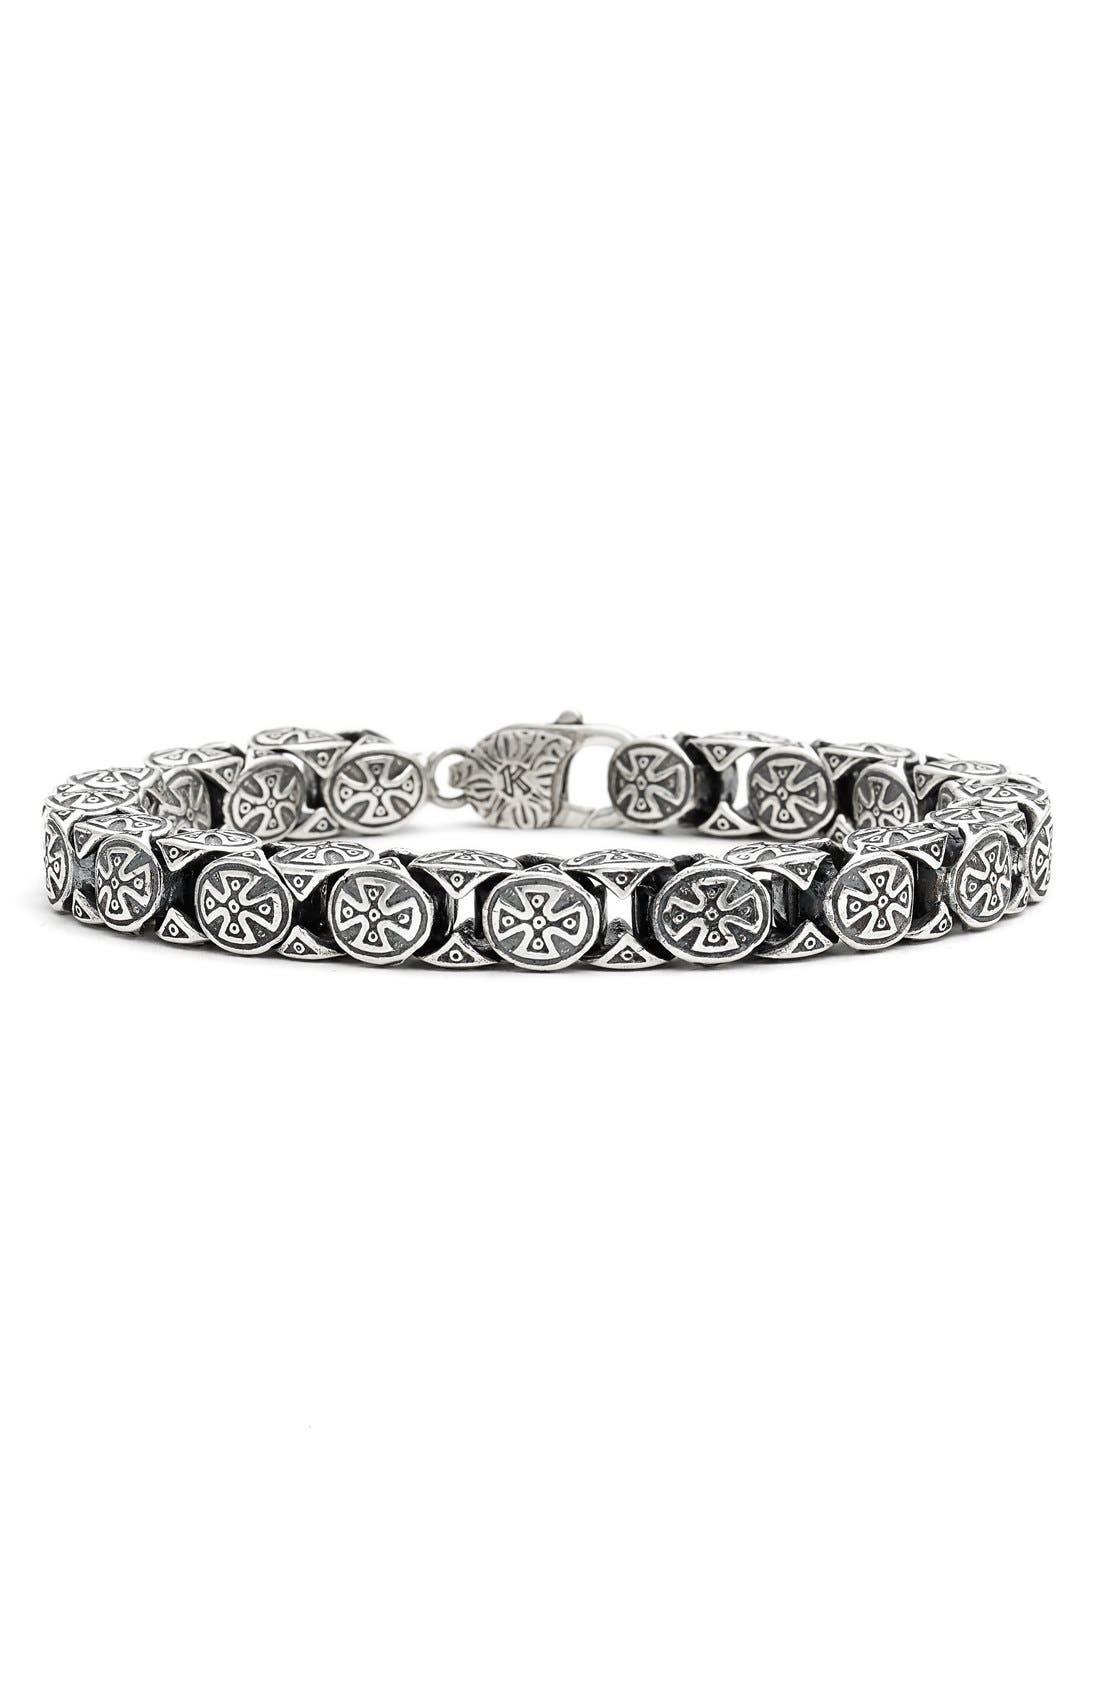 KONSTANTINO 'Minos' Large Cross Bracelet